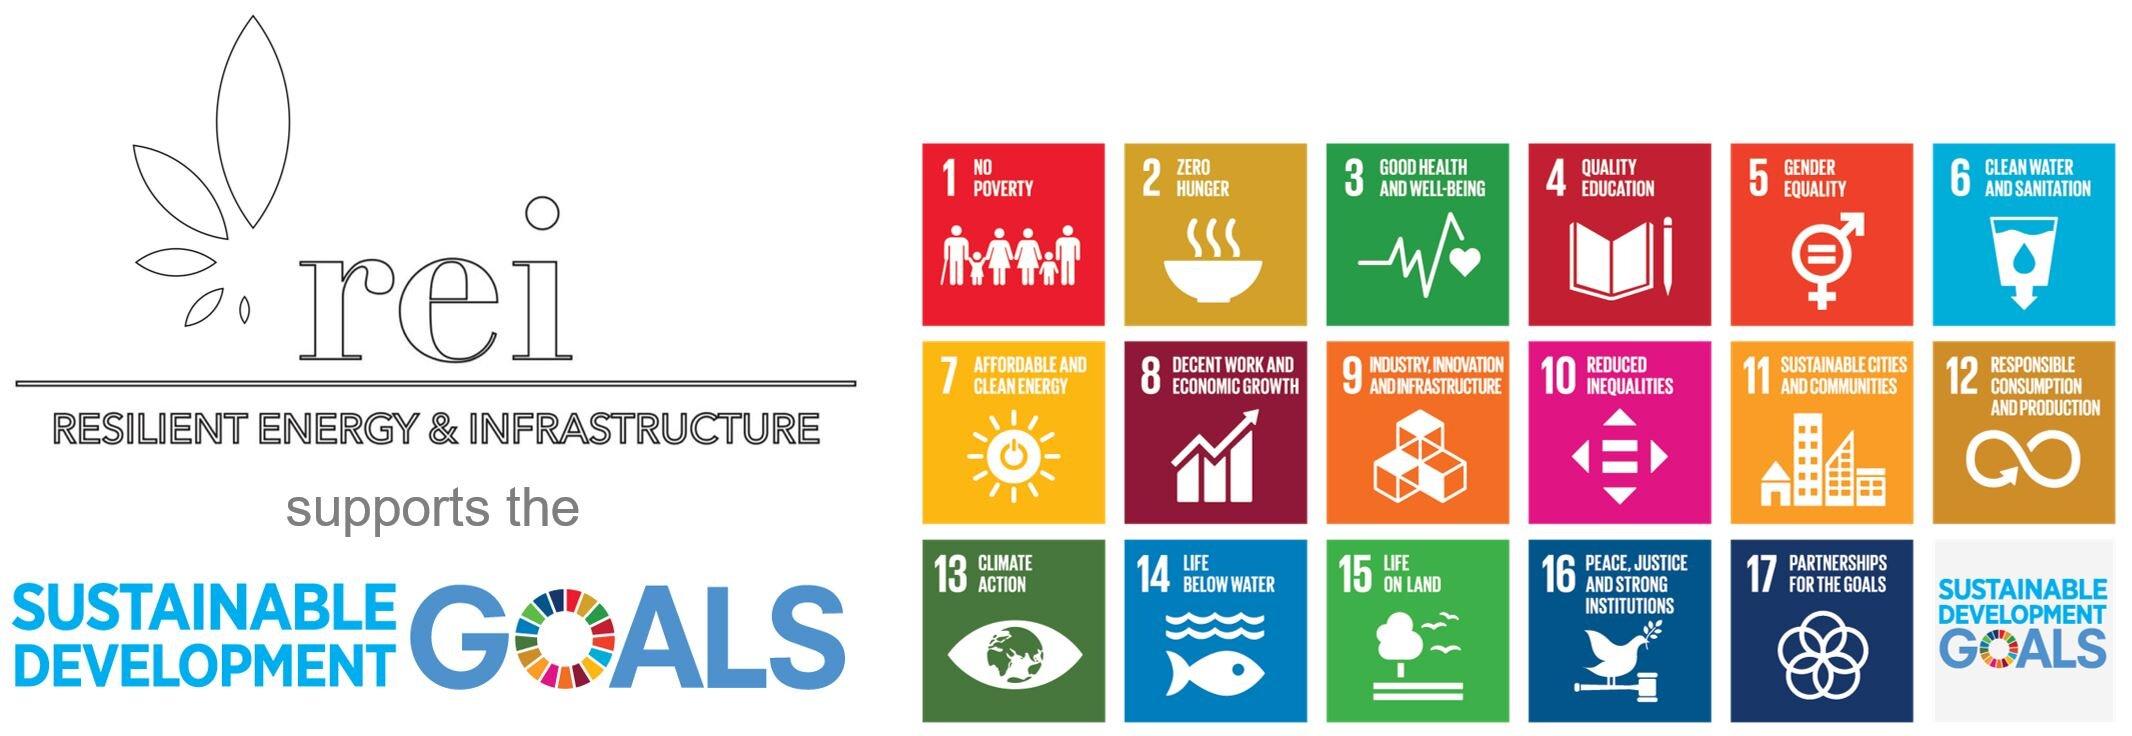 REI re SDGs.JPG